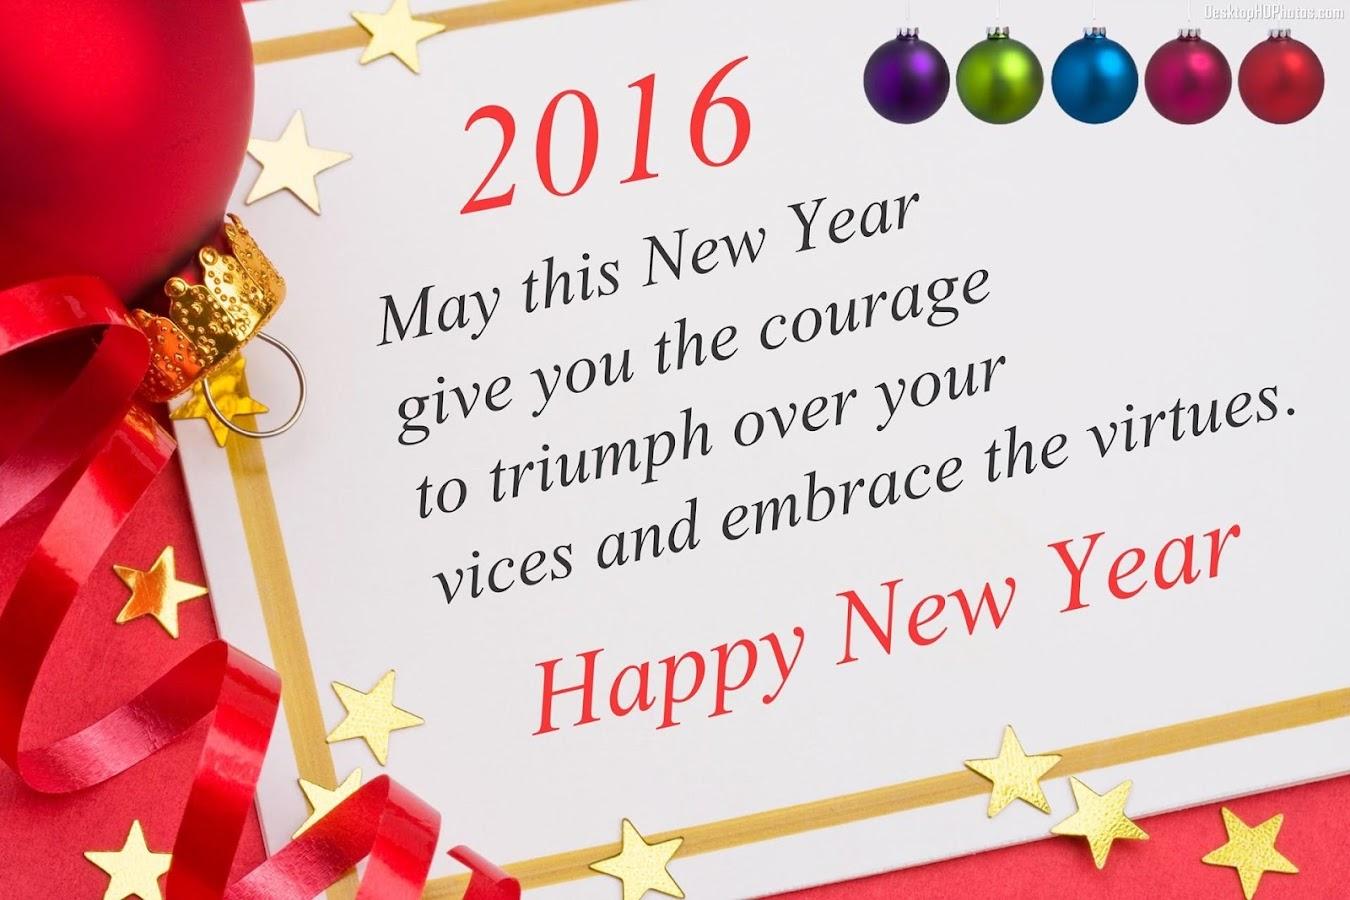 2017 Happy New Year 2017 Youtube Happy New Year 2017 Hd Wallpaper